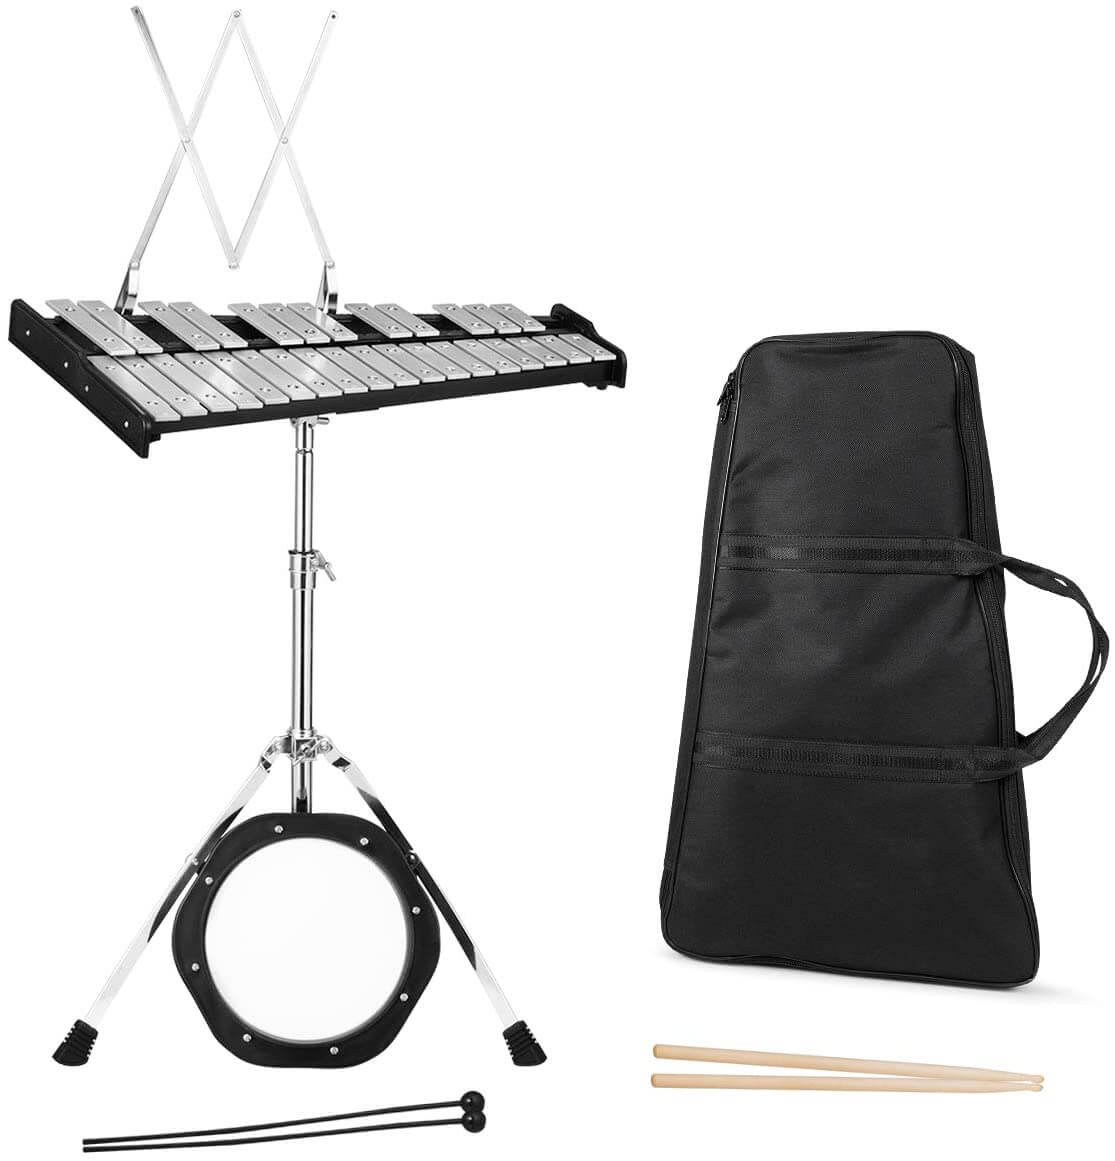 Giantex Percussion Glockenspiel